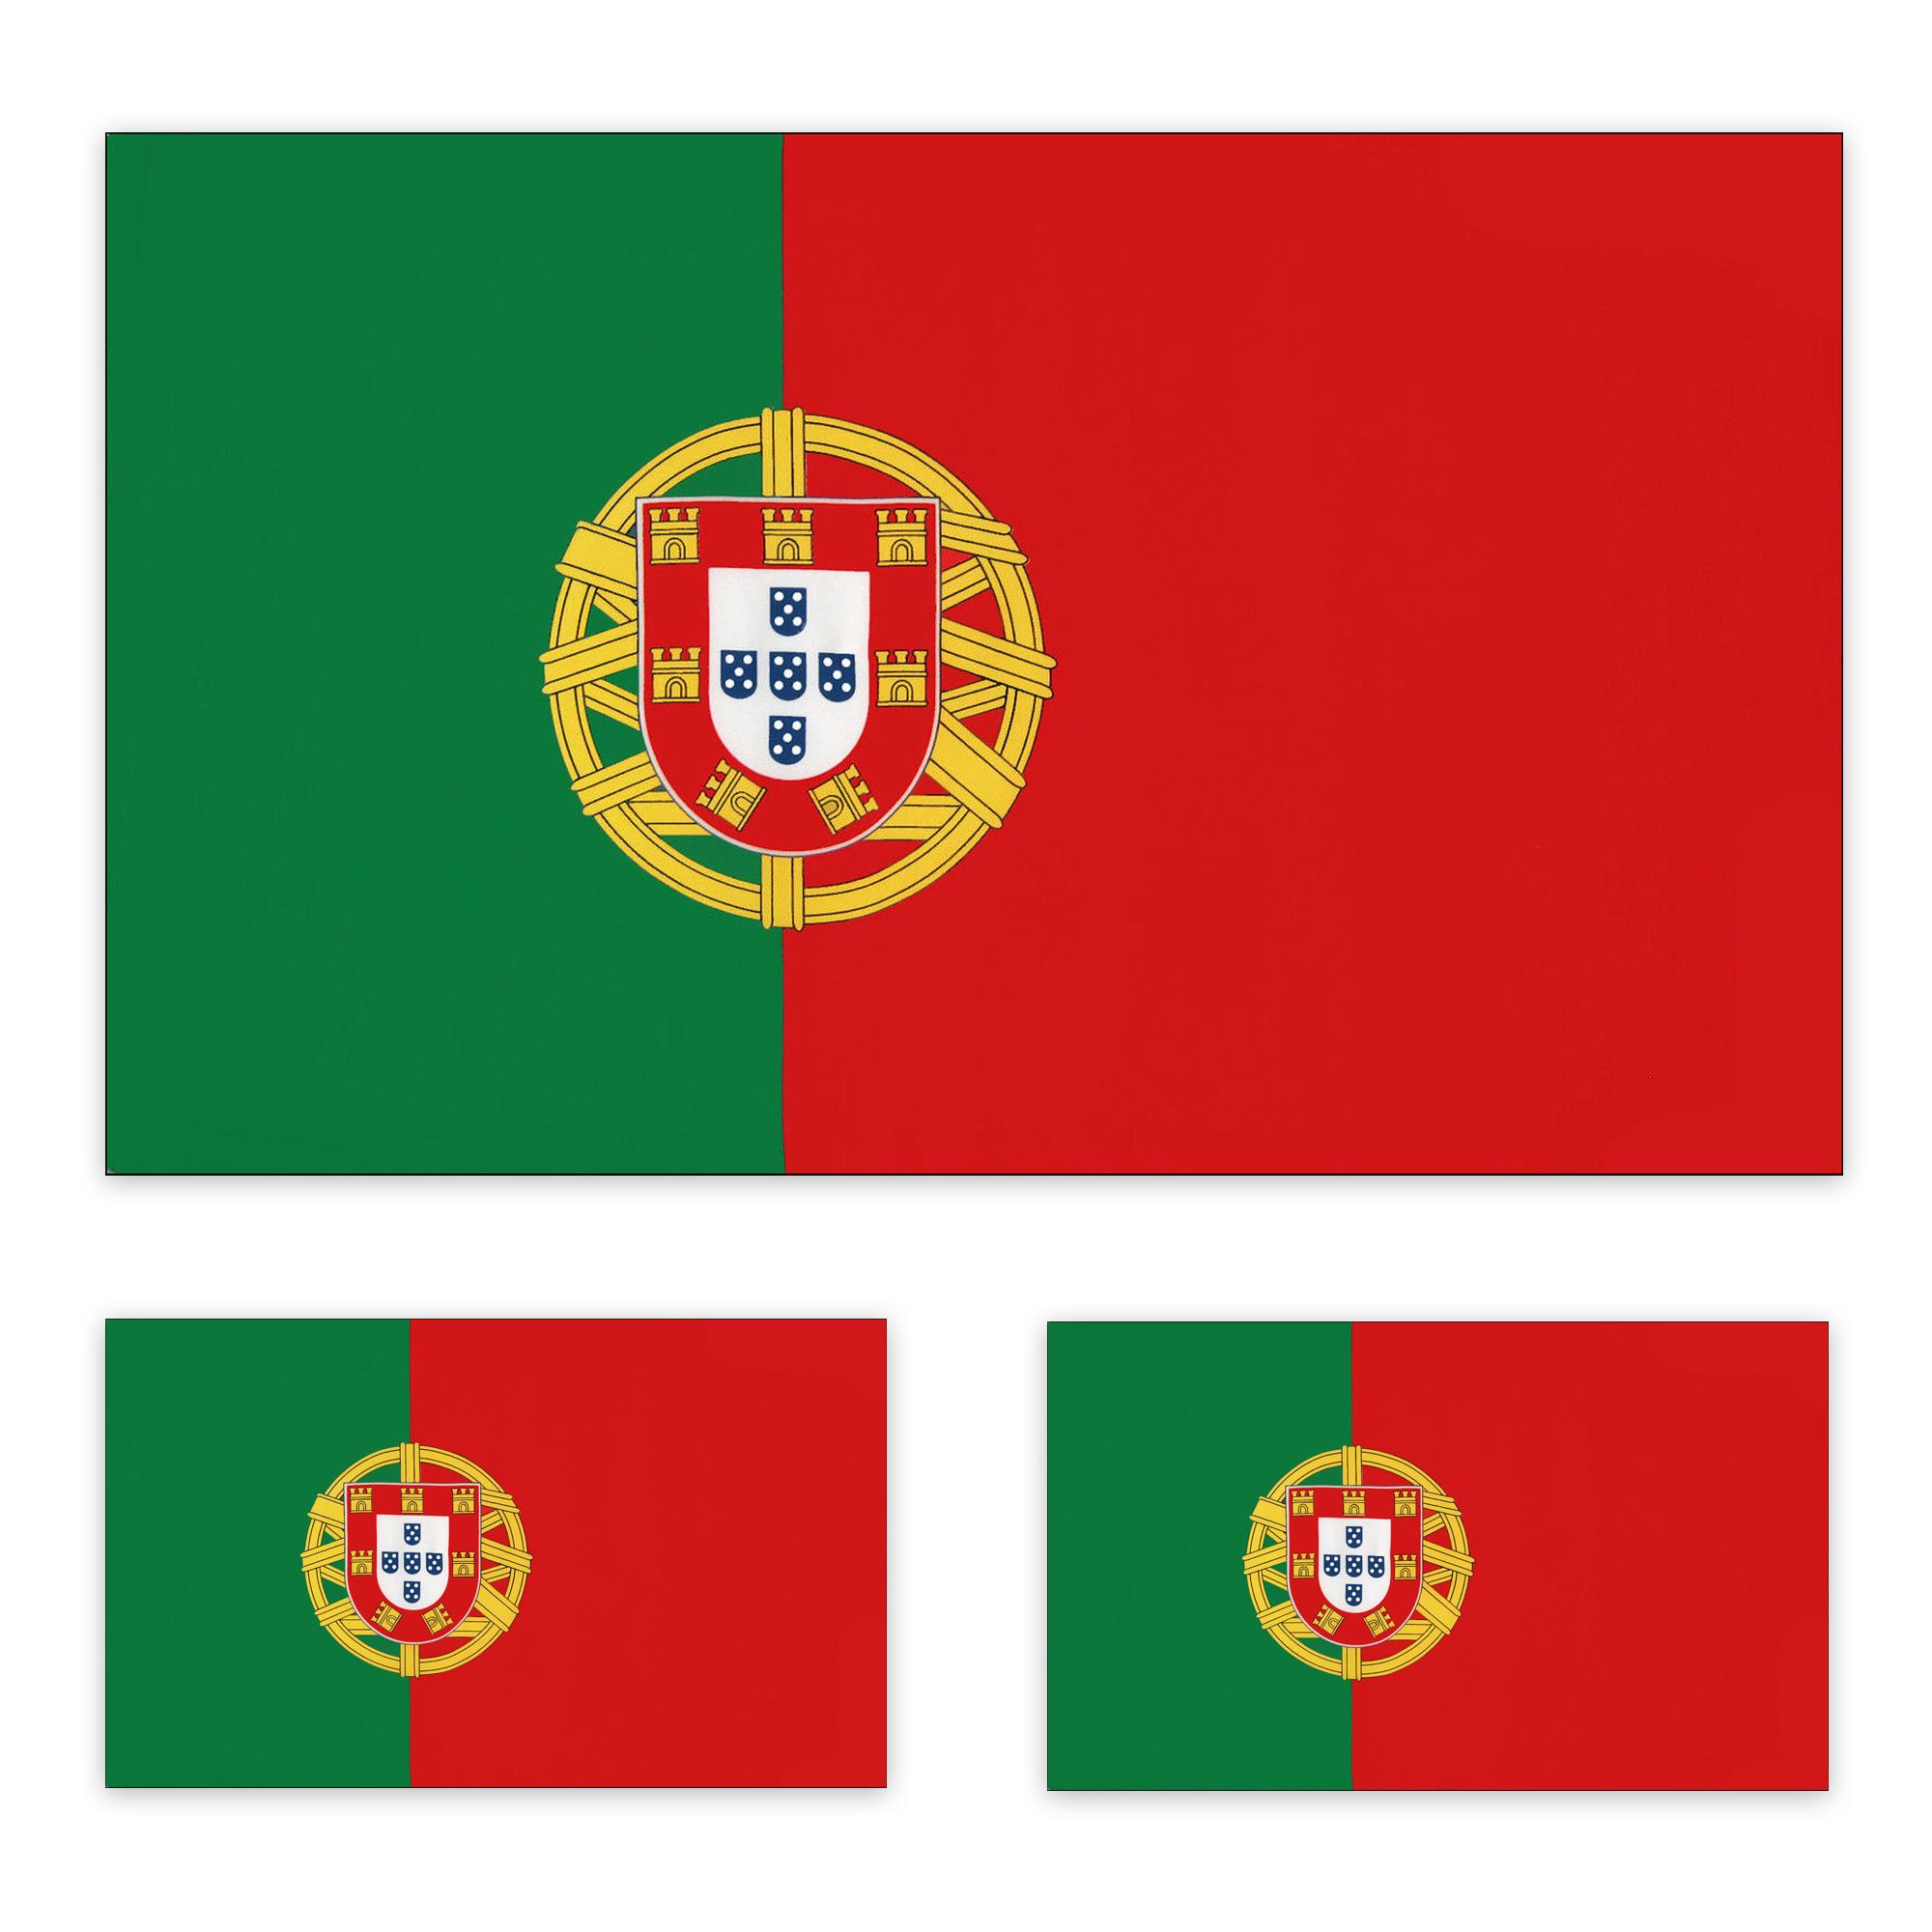 Fahne Schwarz Rot Grün